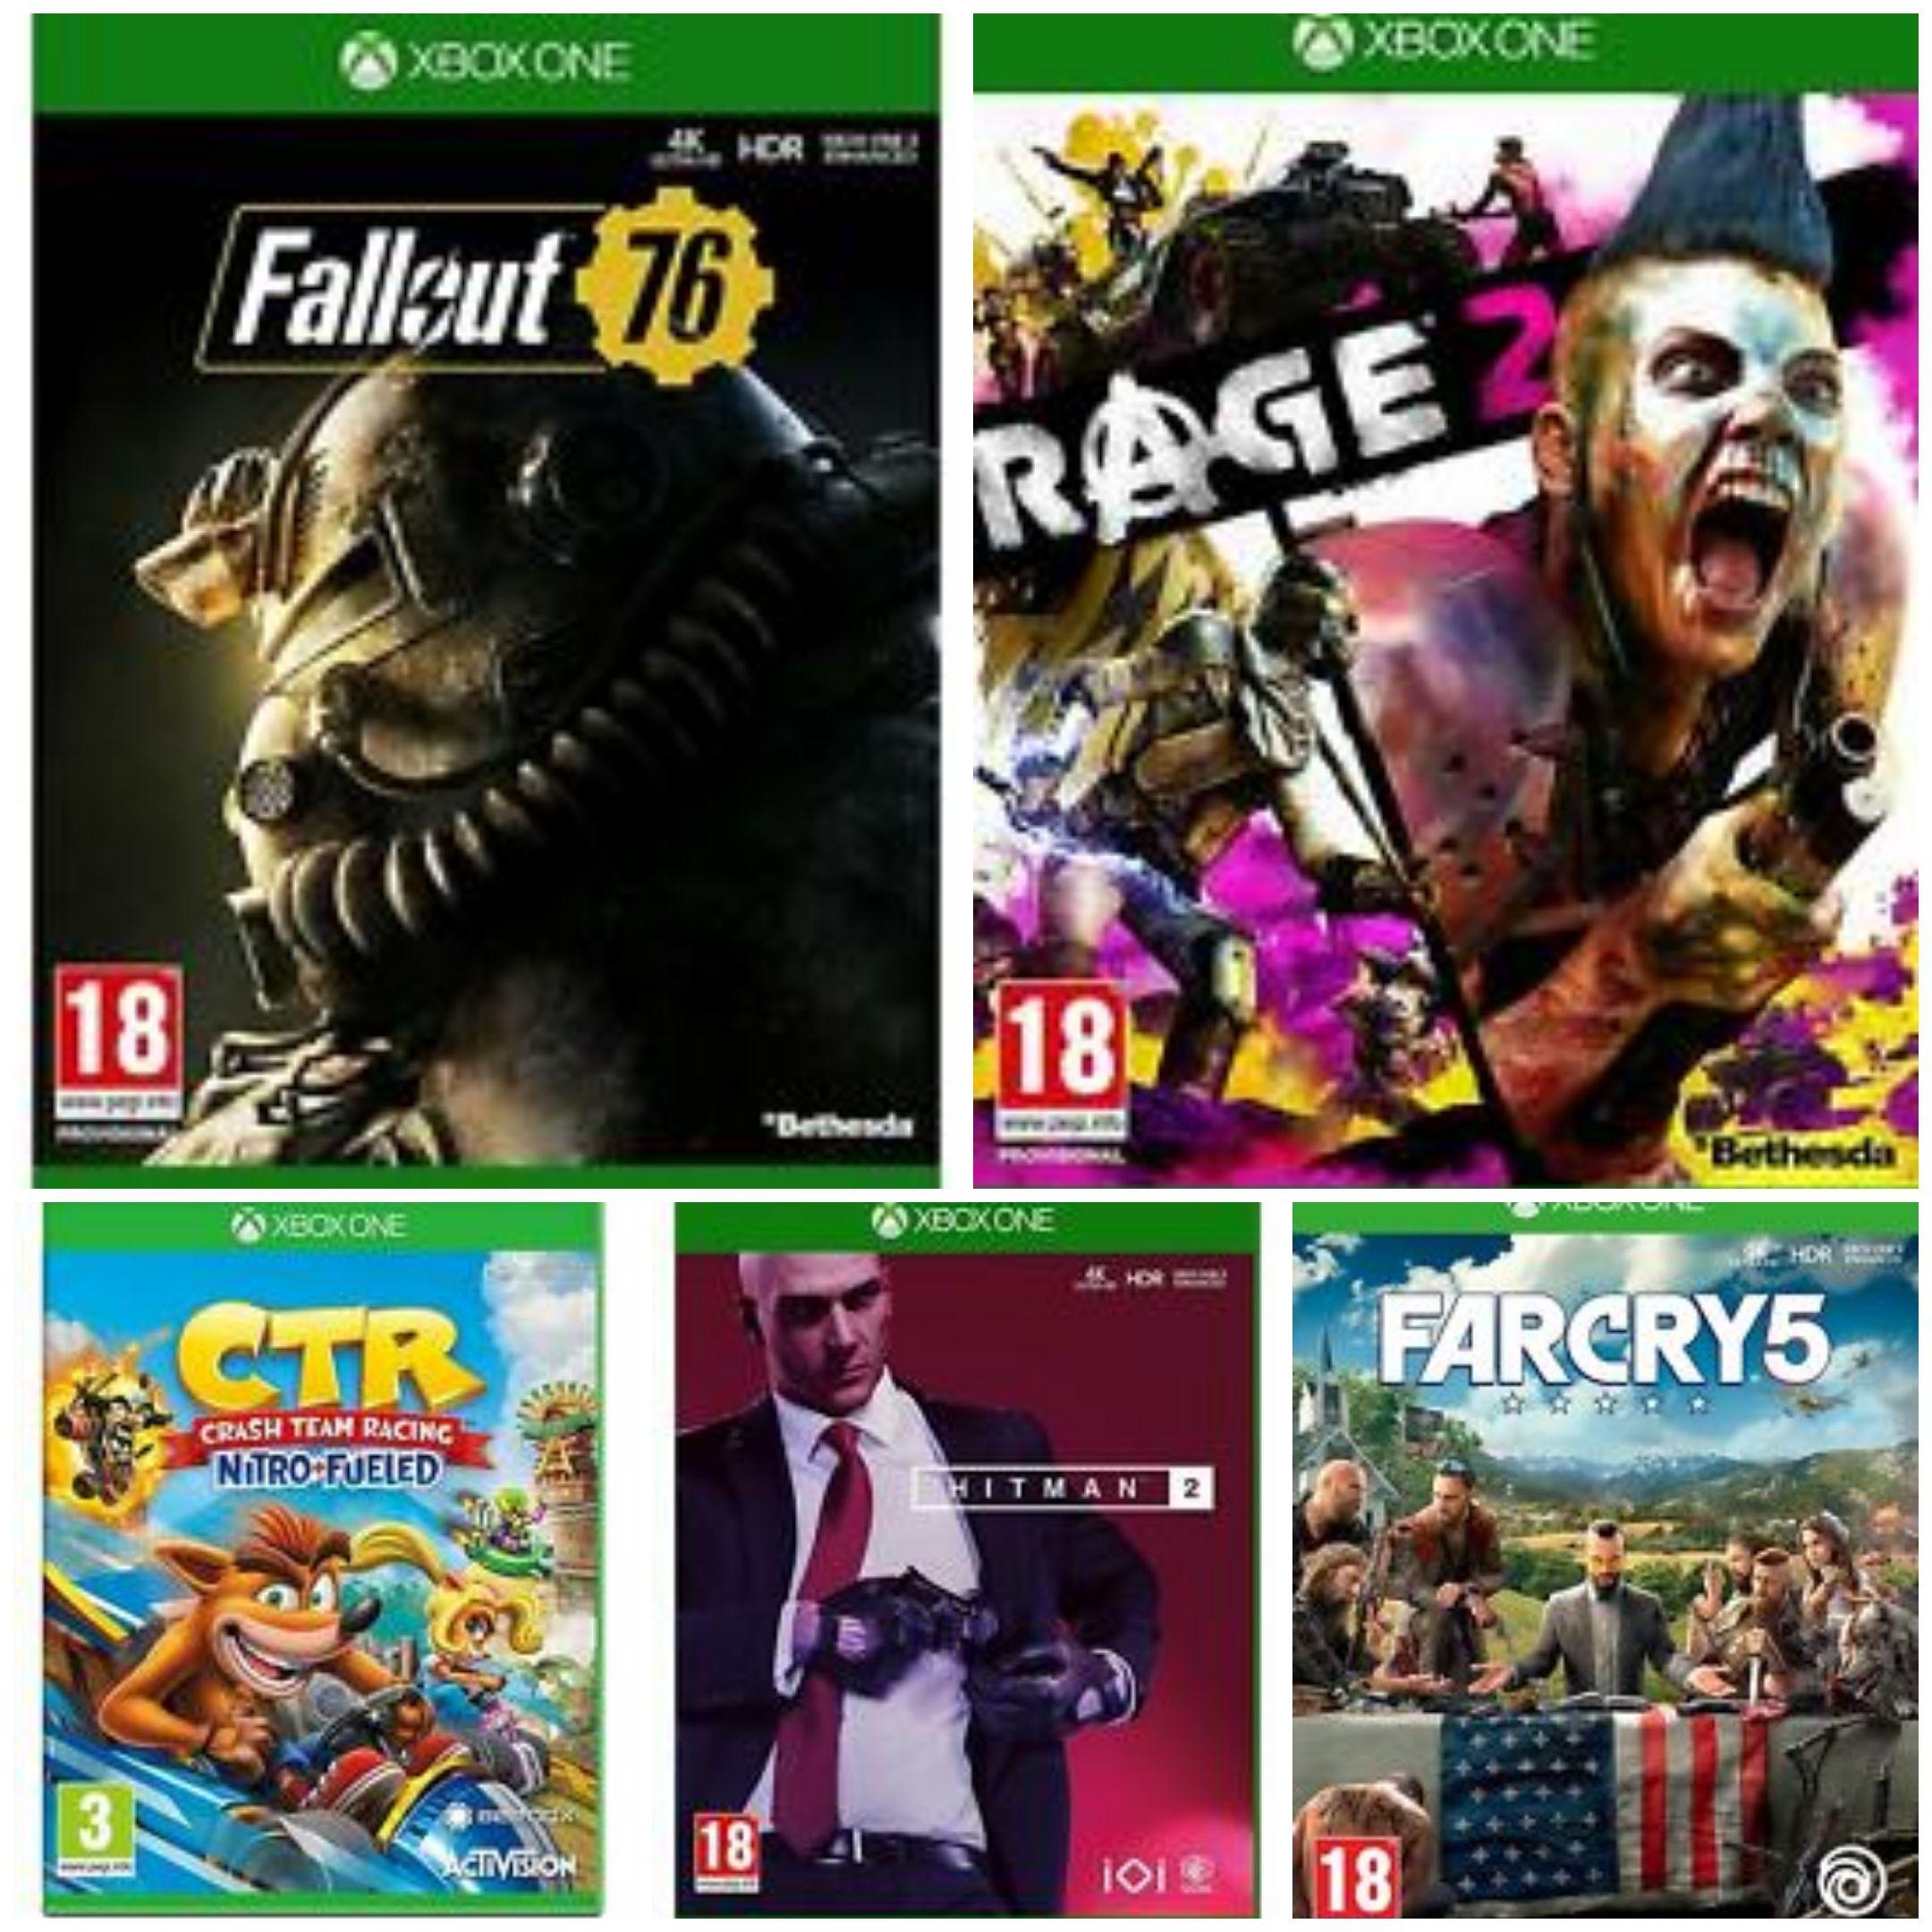 [Xbox One] Fallout 76 £6.99 / Far Cry 5 £8.99 / Hitman 2 £13.99 / Crash Team Racing £15.99 / Rage 2 £16.99 (ex rental) @ boomerangrentals